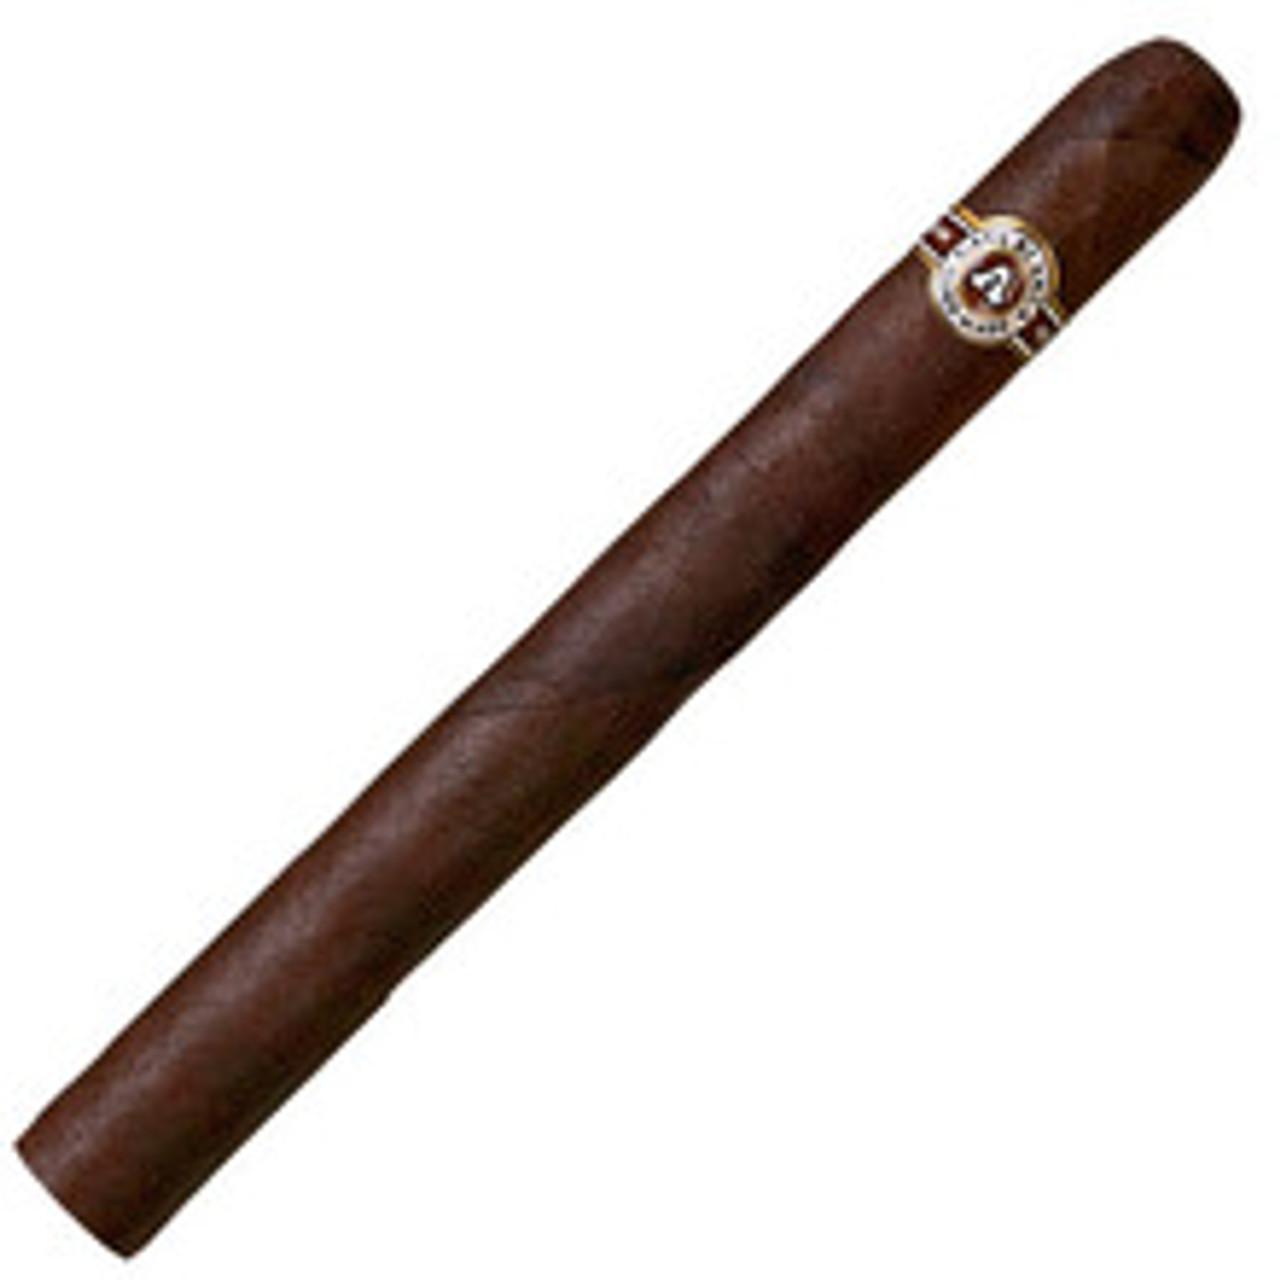 Casa Blanca Jeroboam Maduro Cigars - 10 x 66 (Bundle of 10)